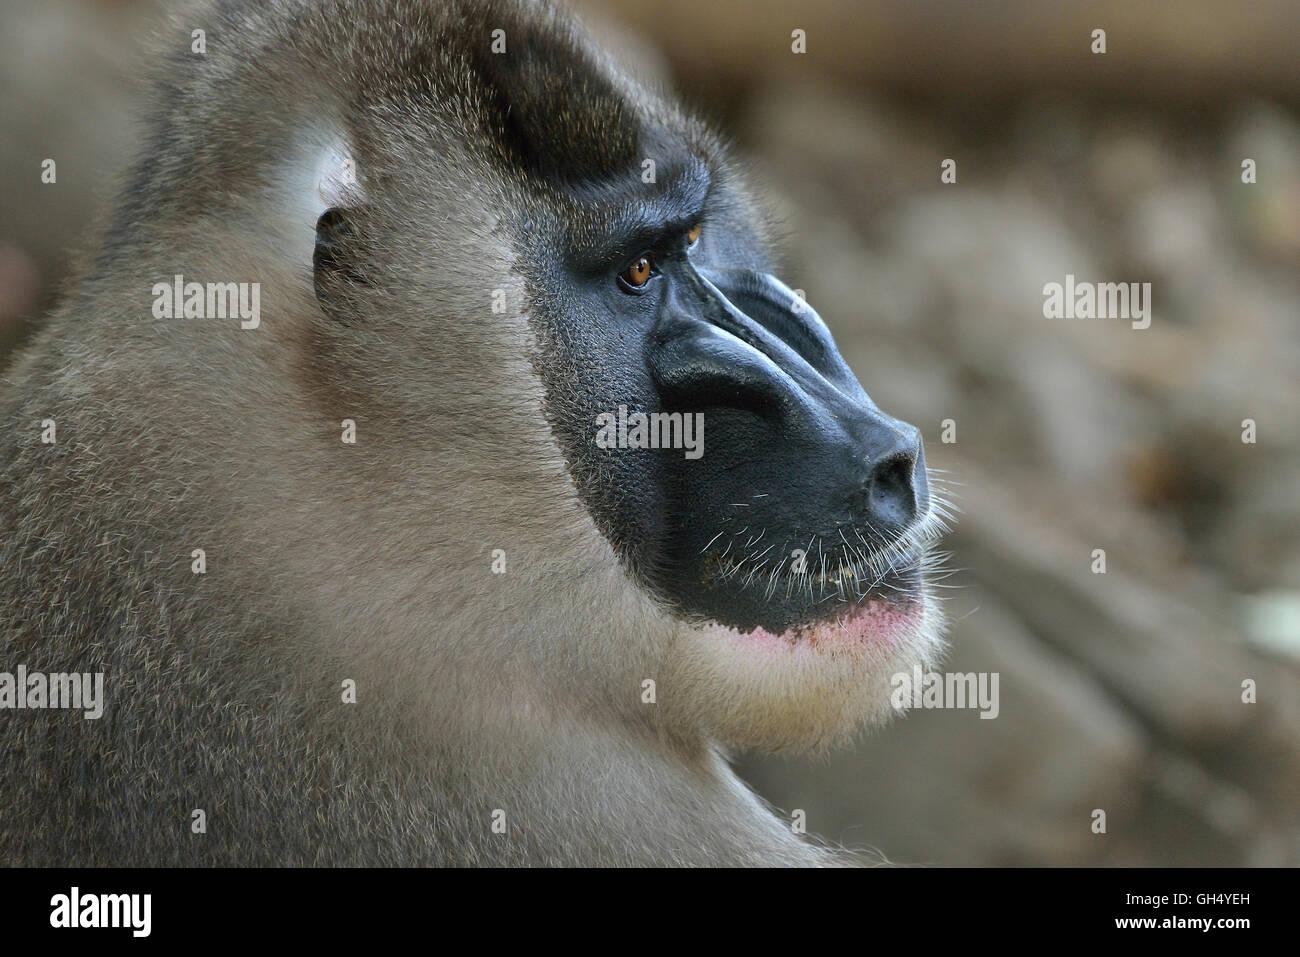 Zoology Animal Mammal Mammalian Monkeys Stock Photos